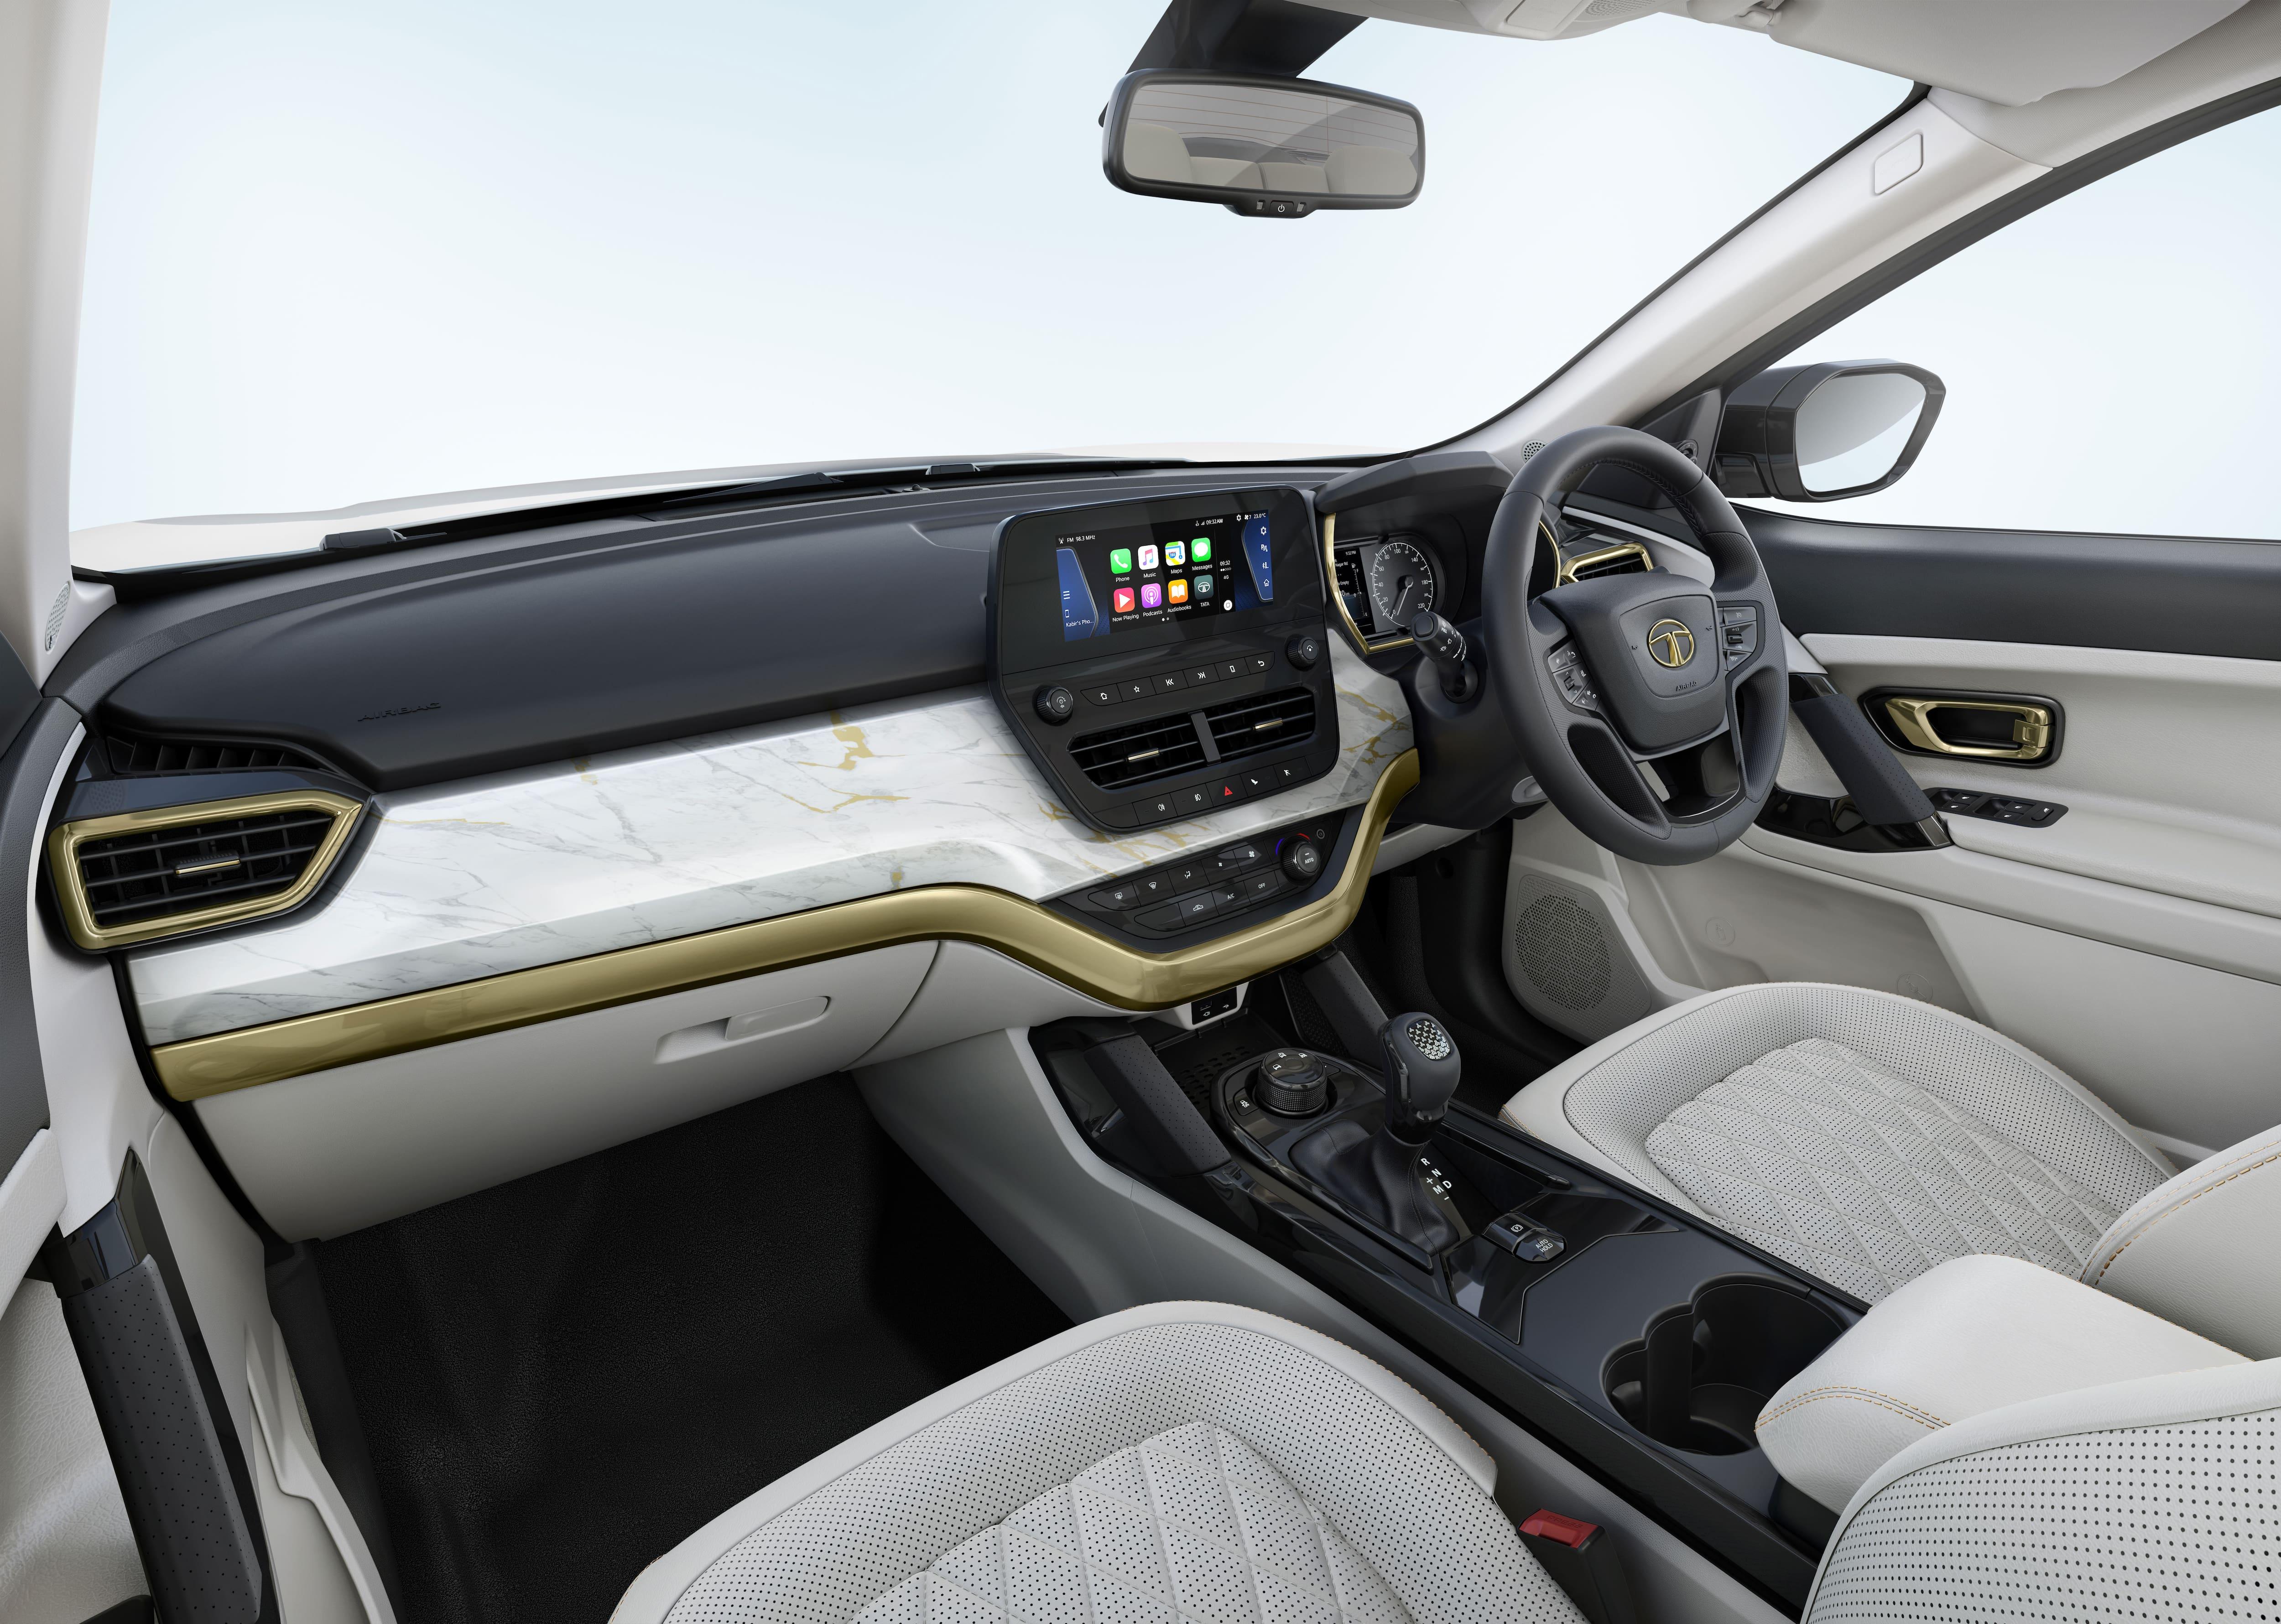 Interiores de Tata Safari en oro blanco